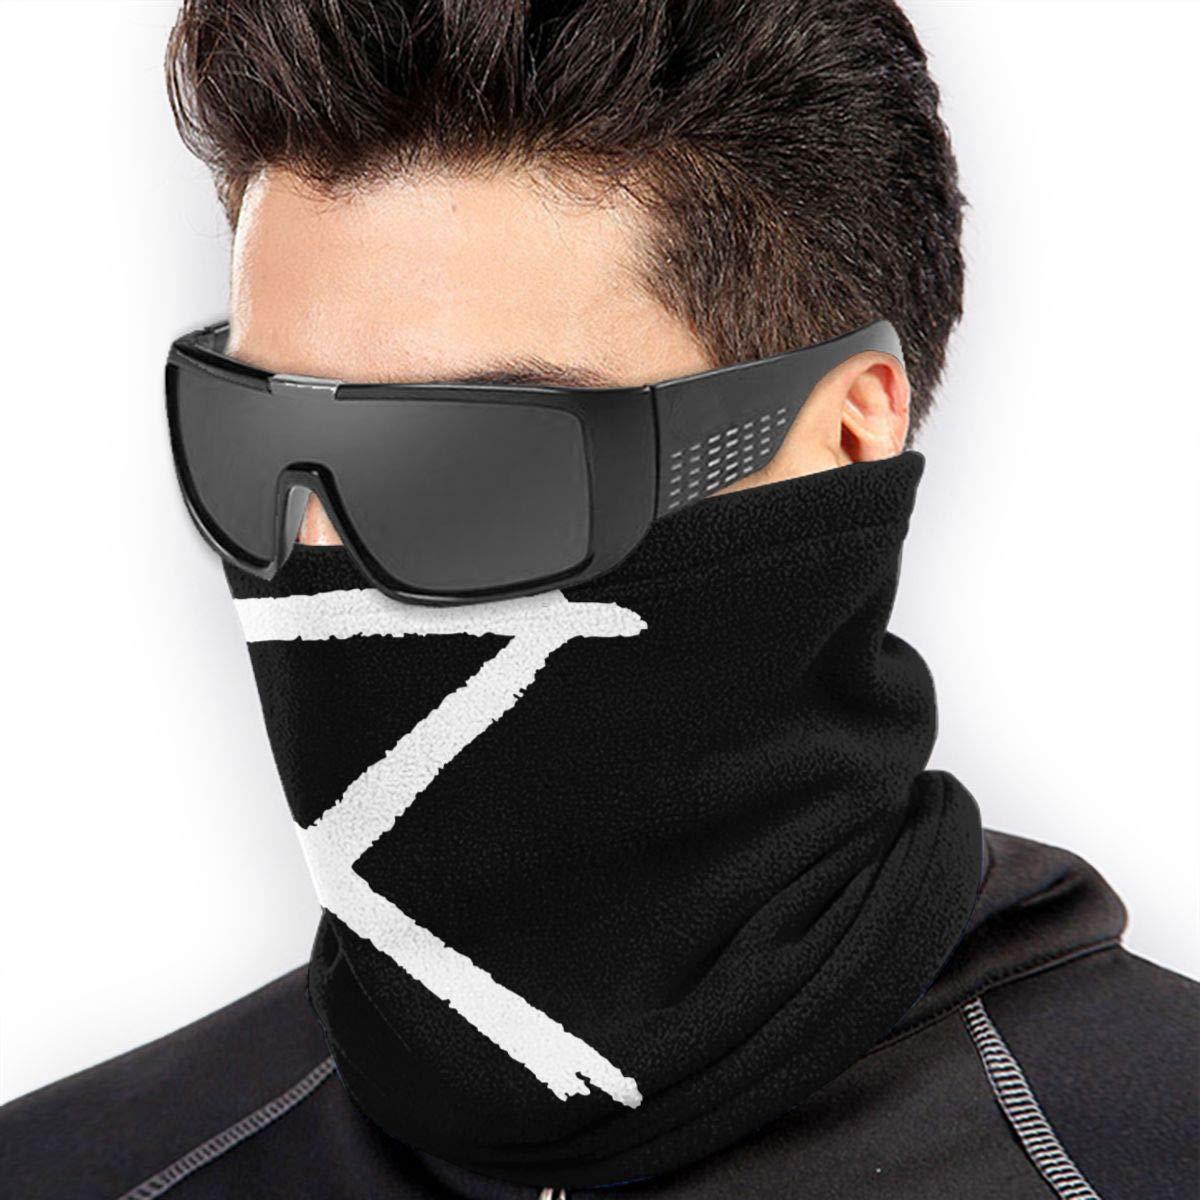 Circa Survive Fleece Neck Warmer Windproof Winter Neck Gaiter Cold Weather Face Mask For Men Women 1011.6 Inch